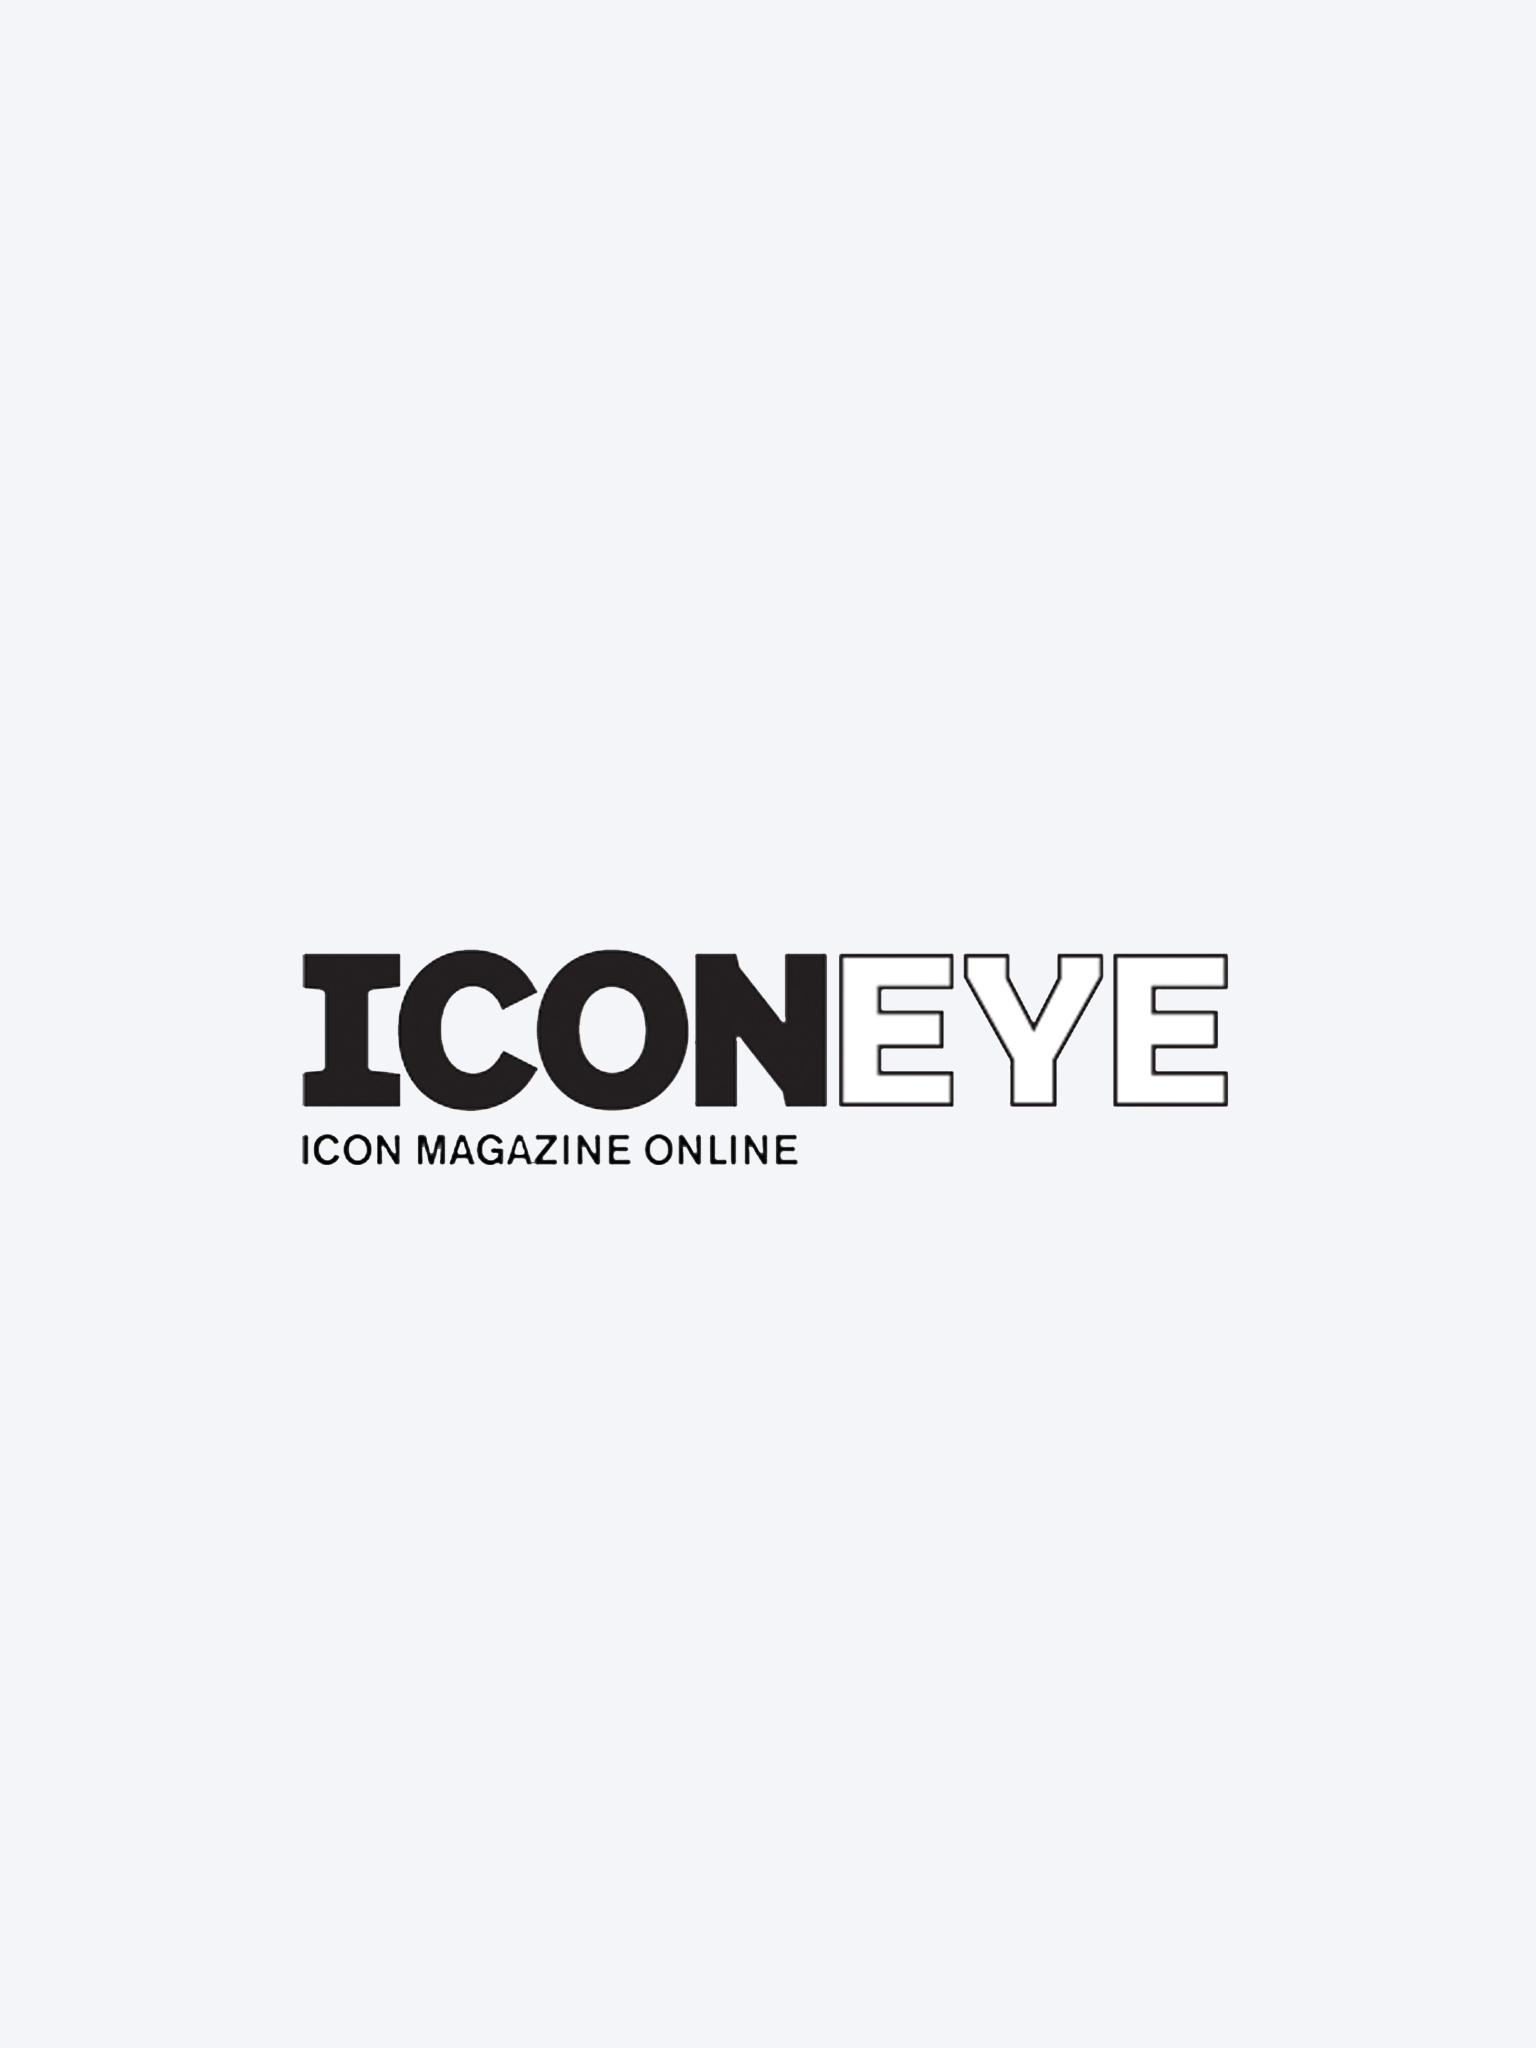 ICONEYE – Jun 15